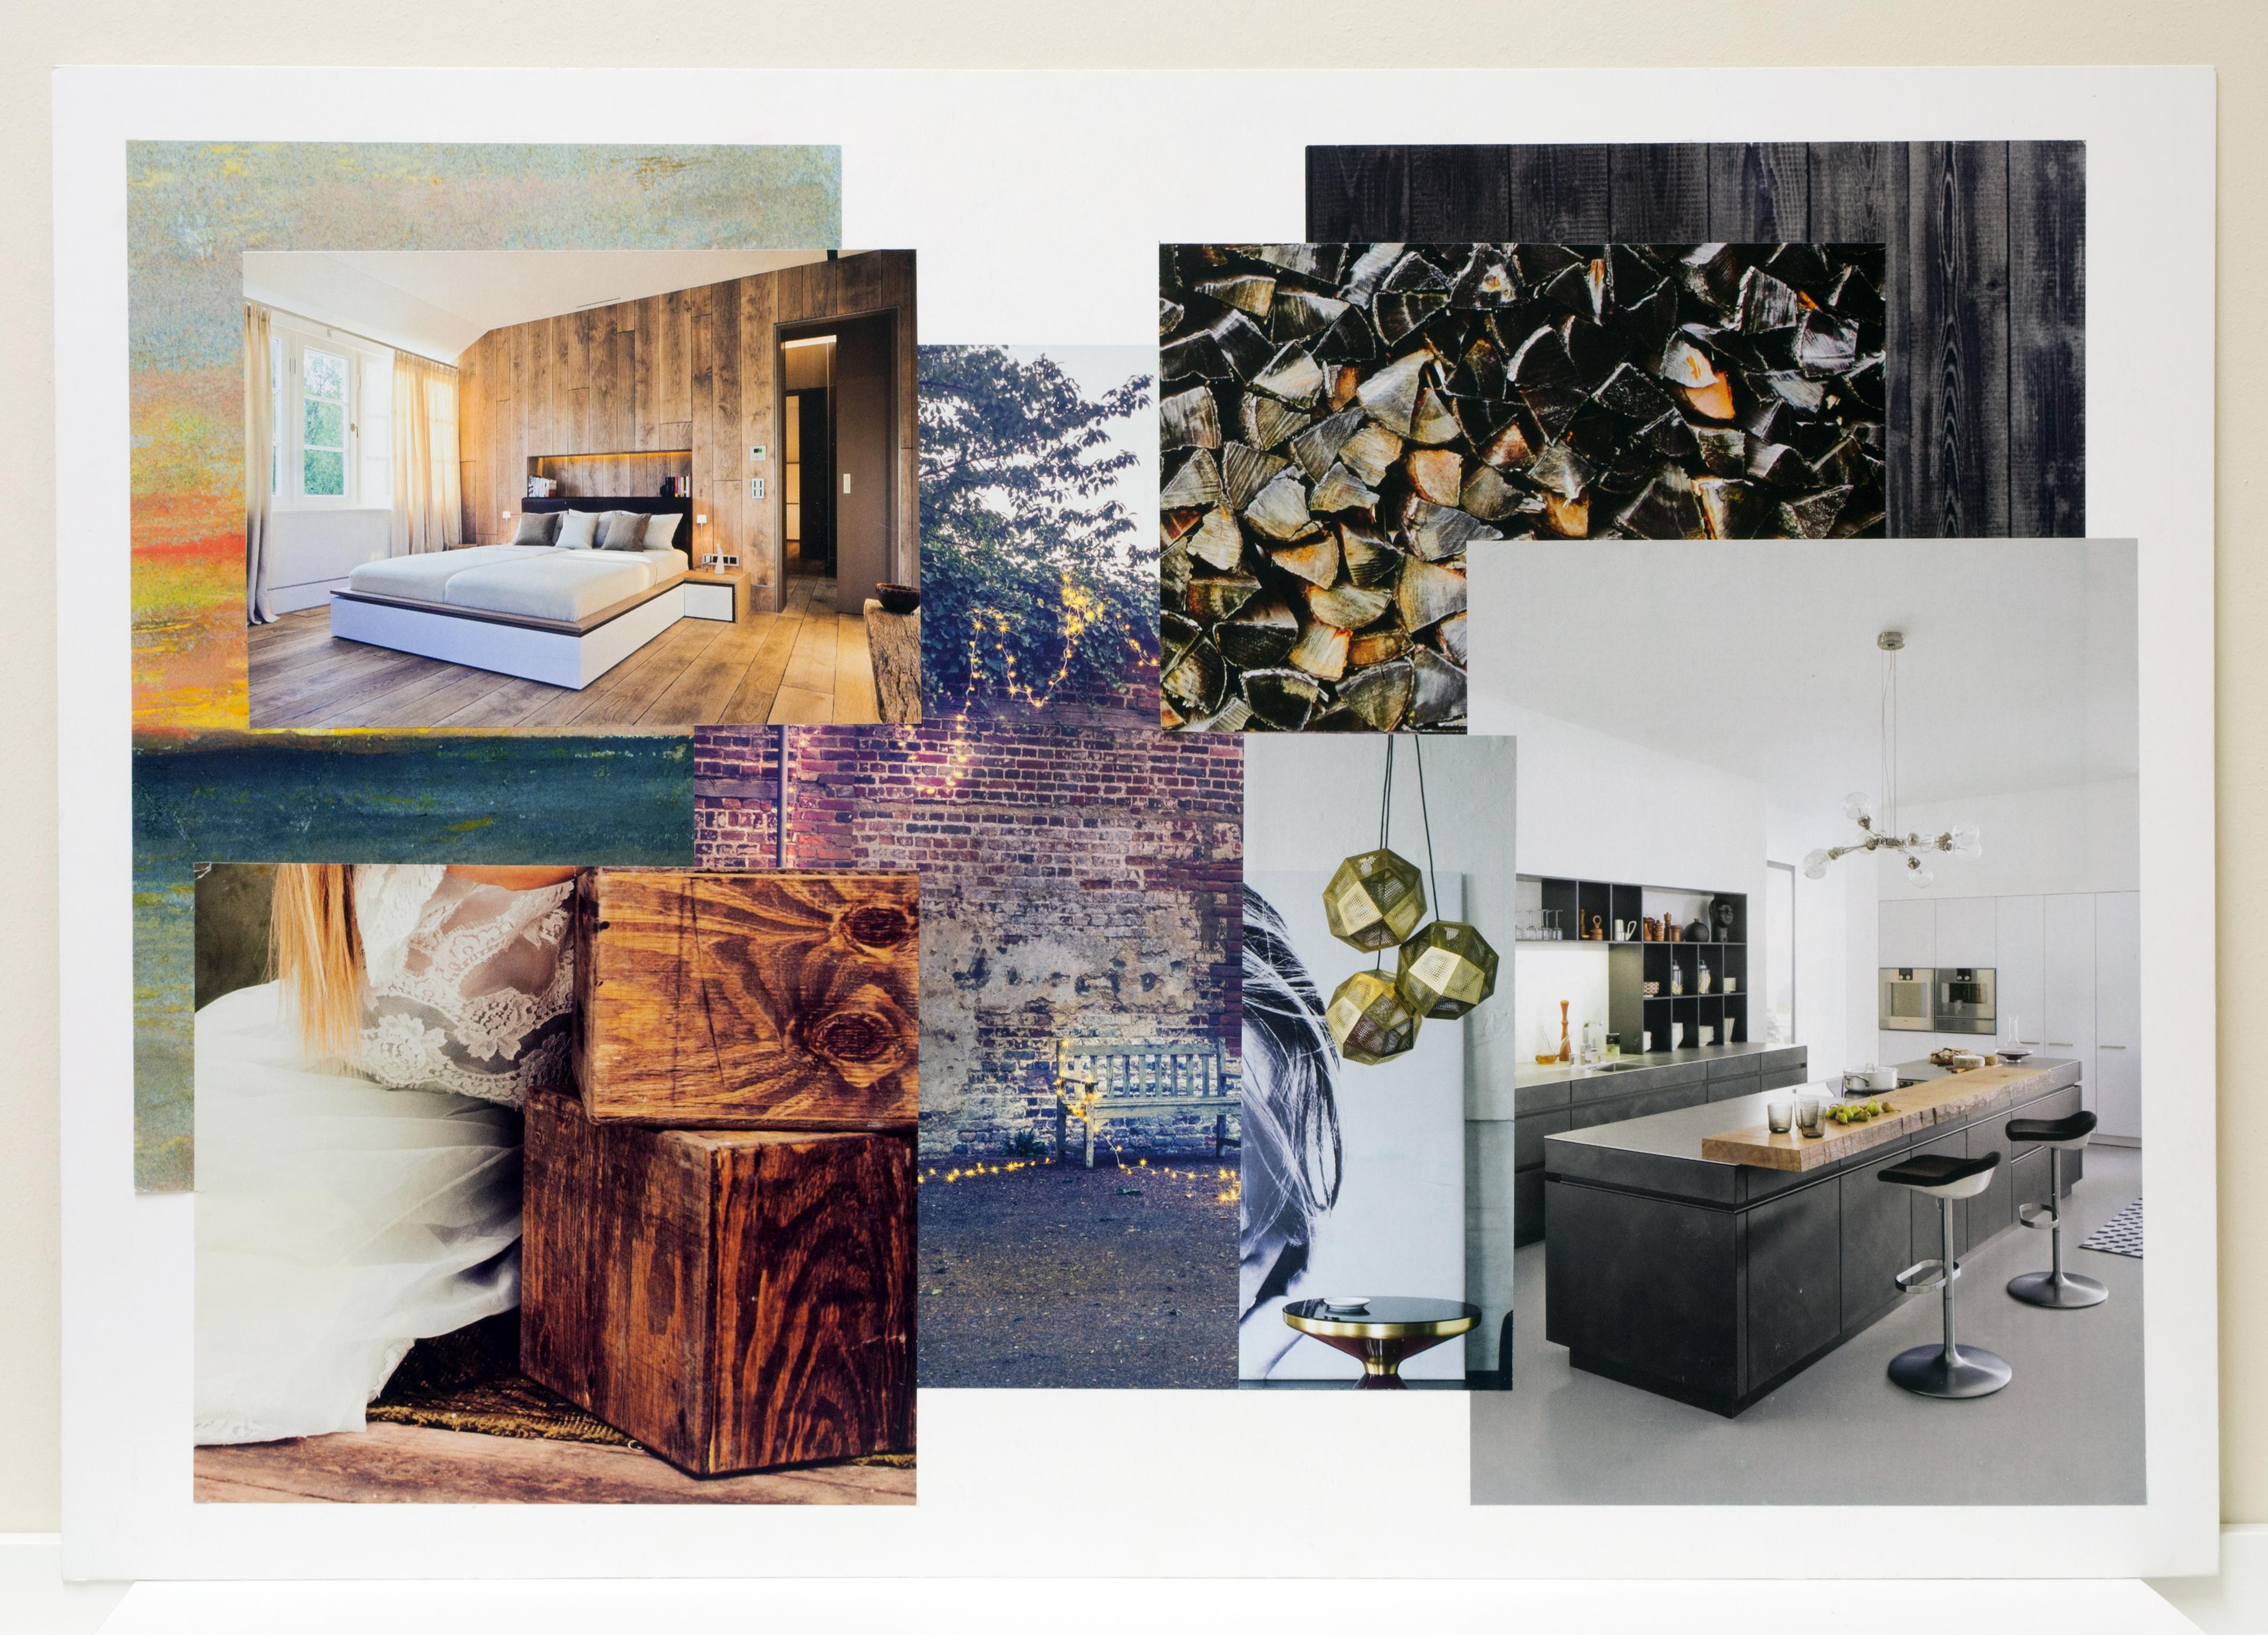 Design Trends for Interiors